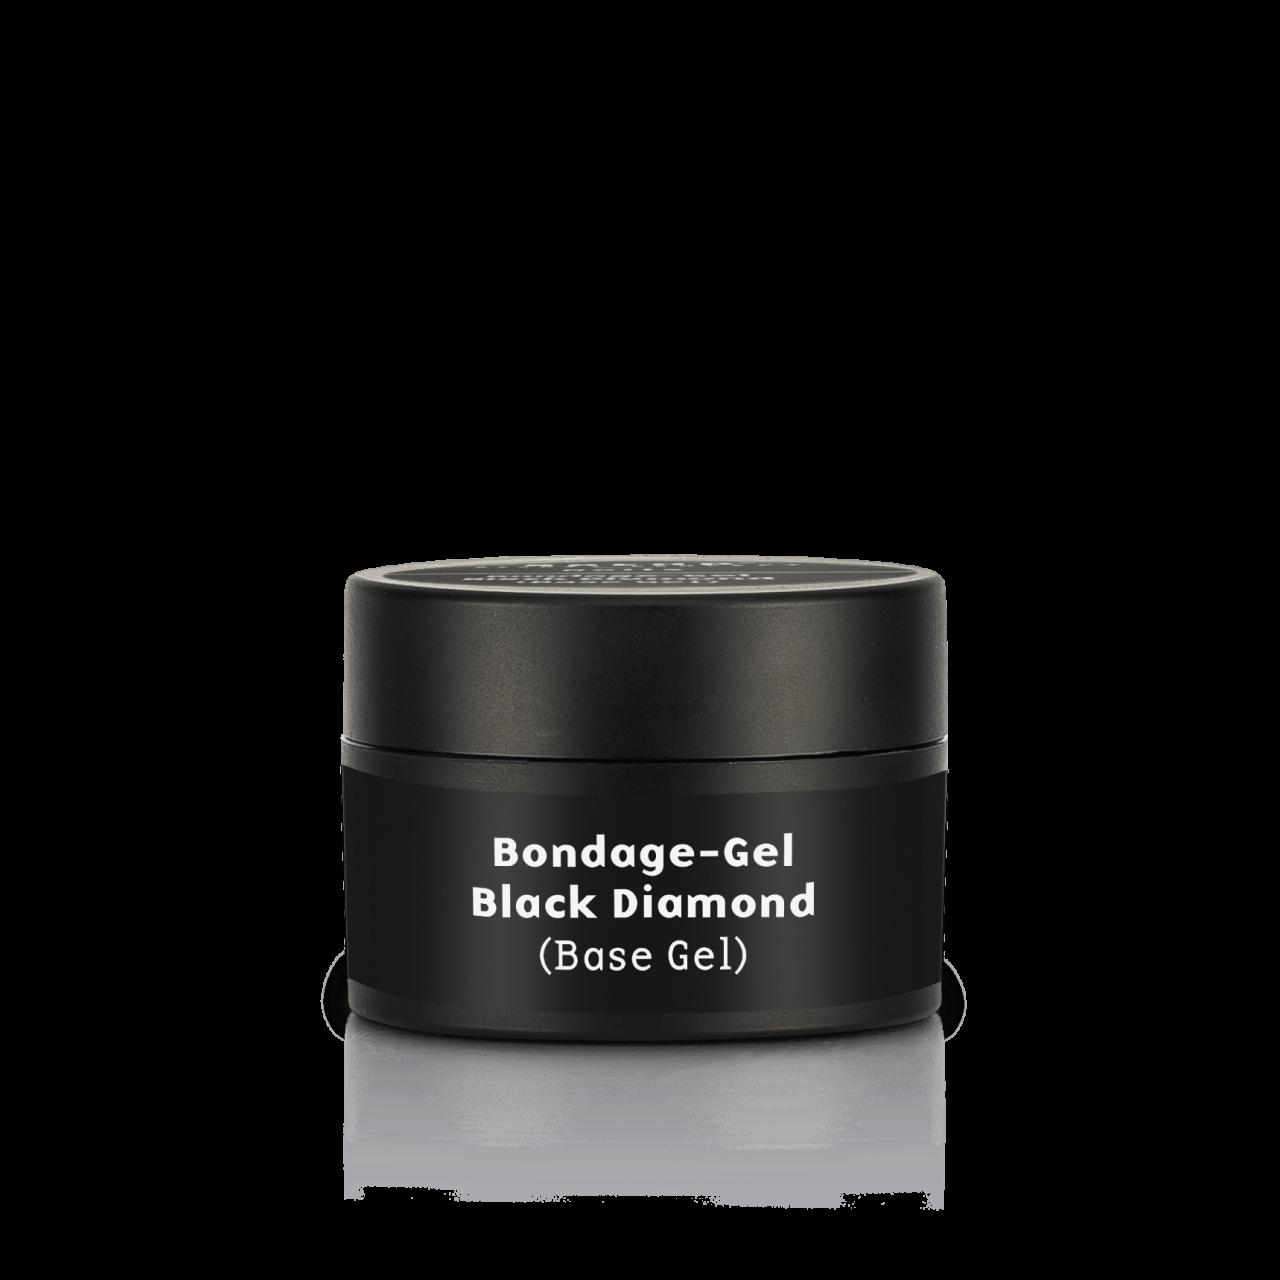 Bondage-Gel Black Diamond 30 ml